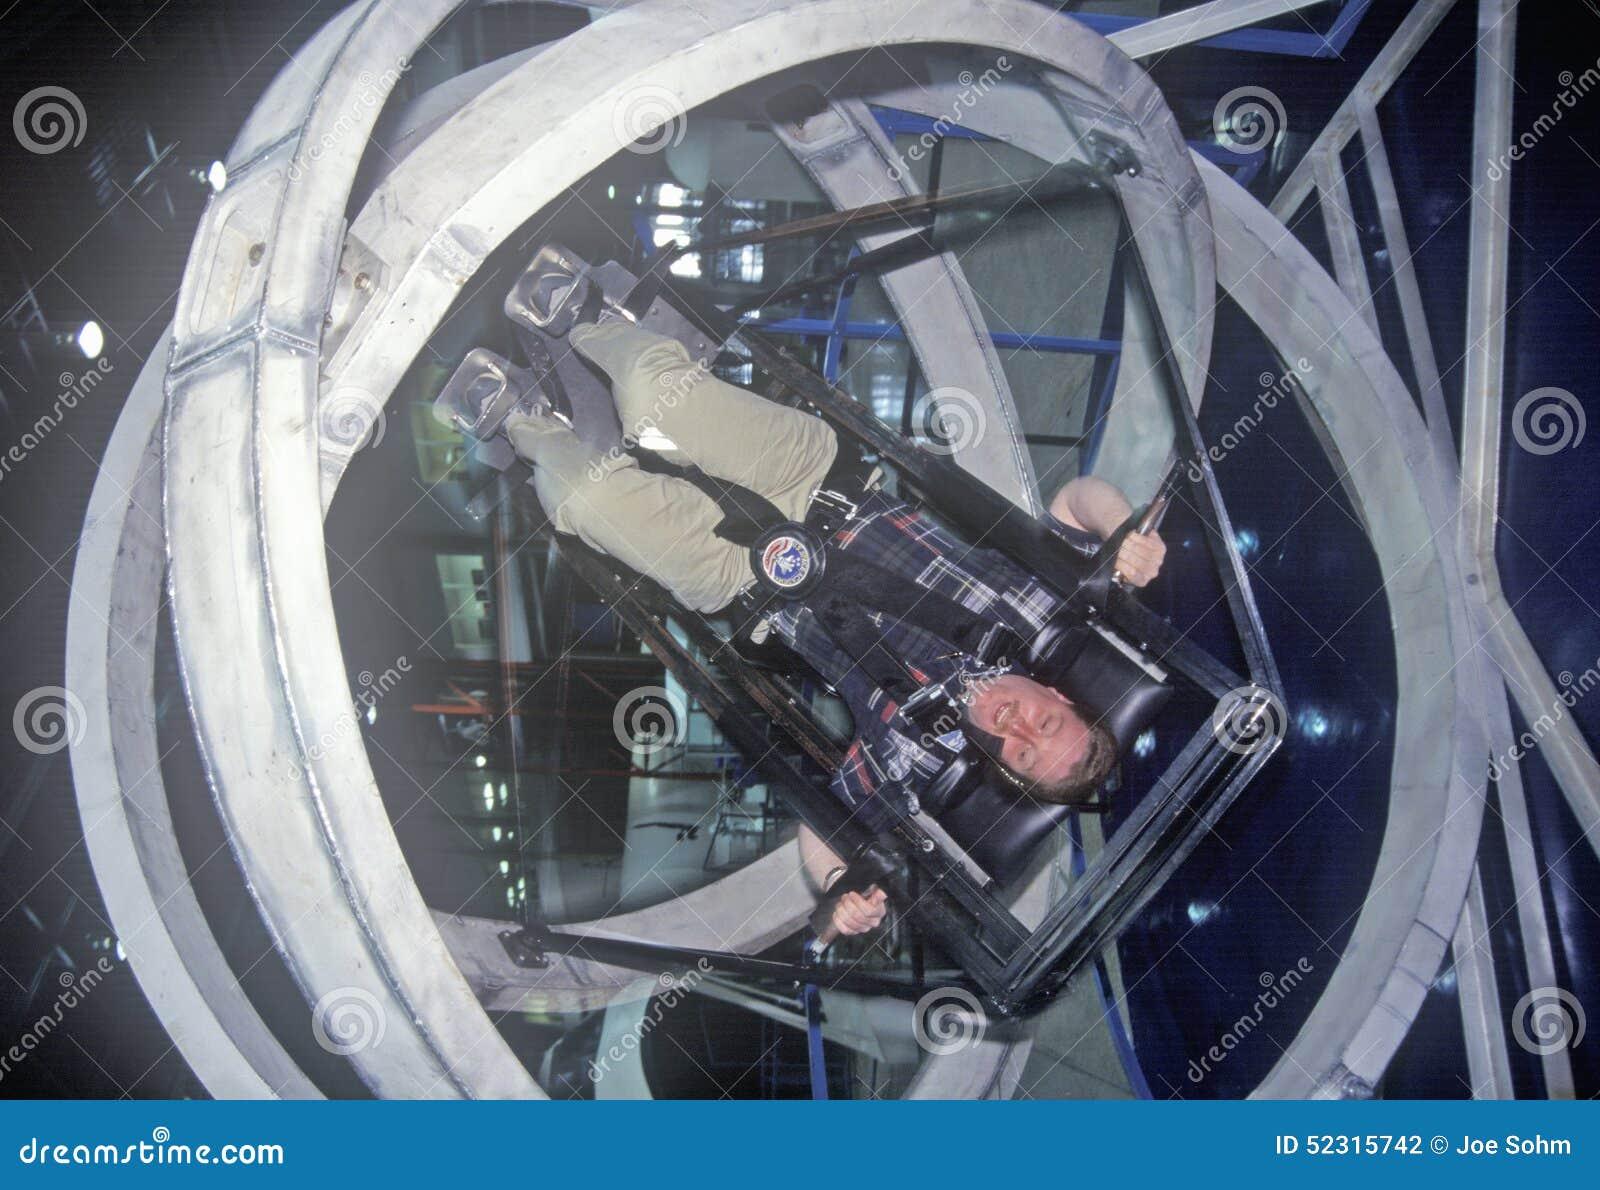 Kind in der Antigravitationsübungsmaschine am Raum-Lager, George C Marshall Space Flight Center, Huntsville, AL